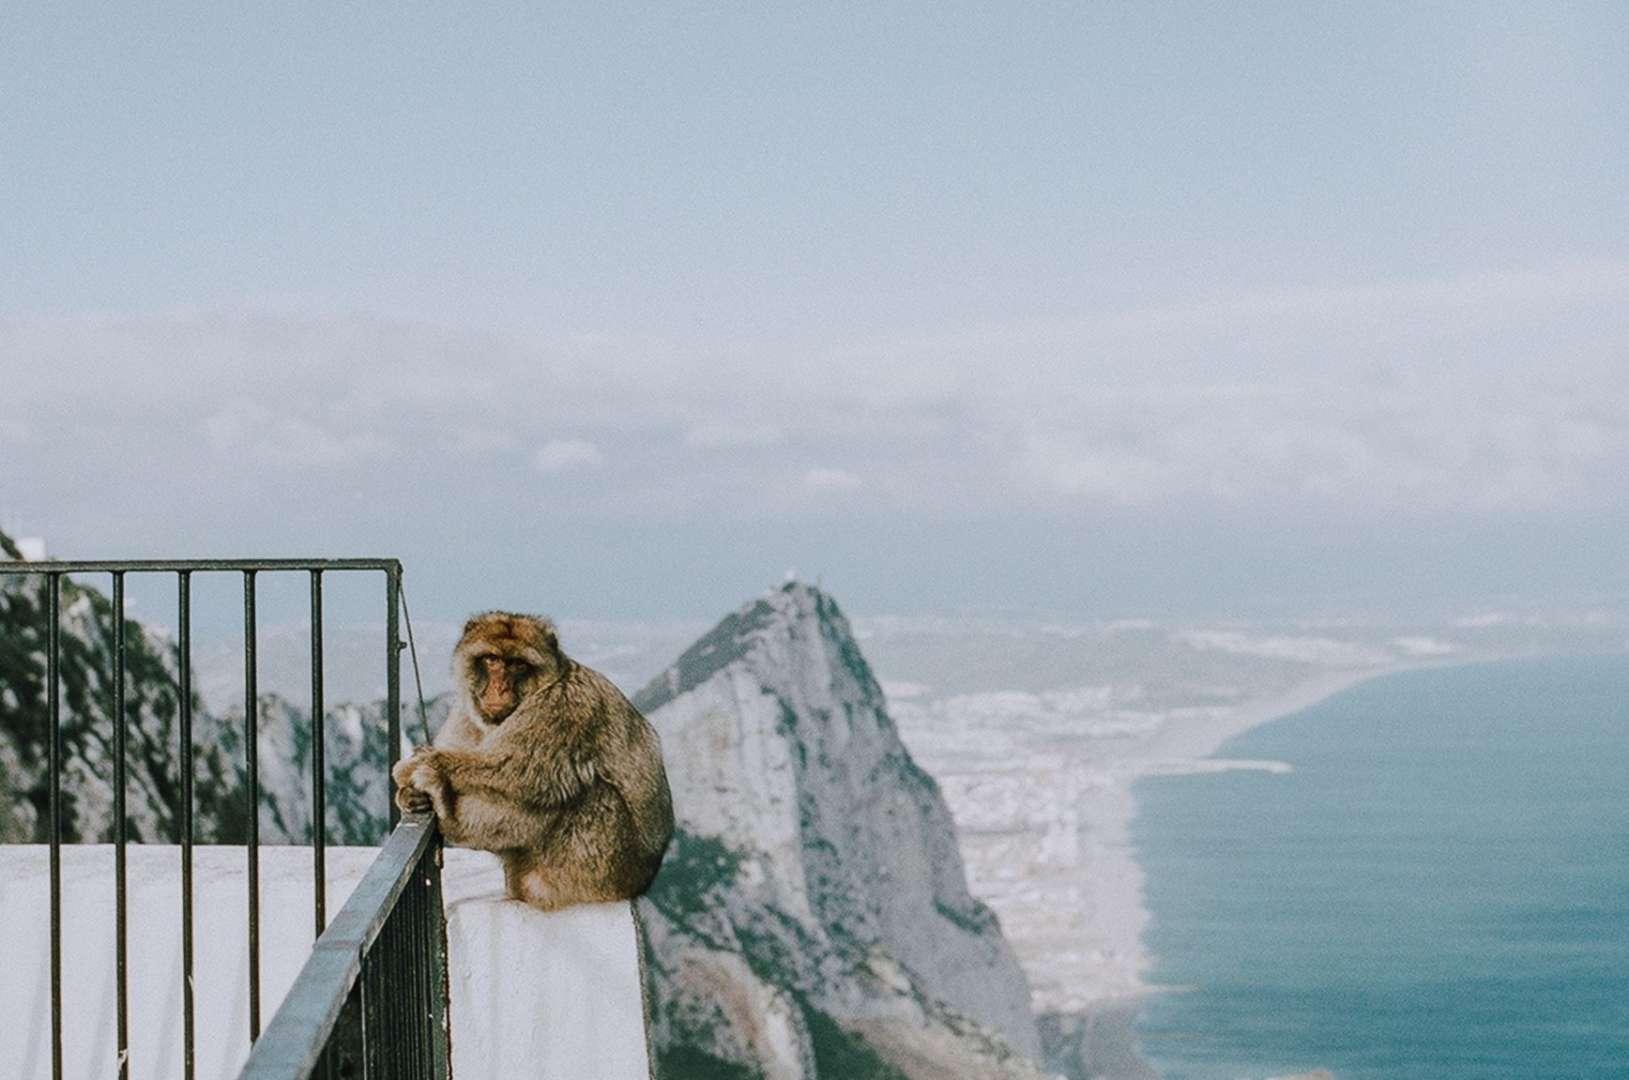 Reasons to Visit Gibraltar - The Monkeys